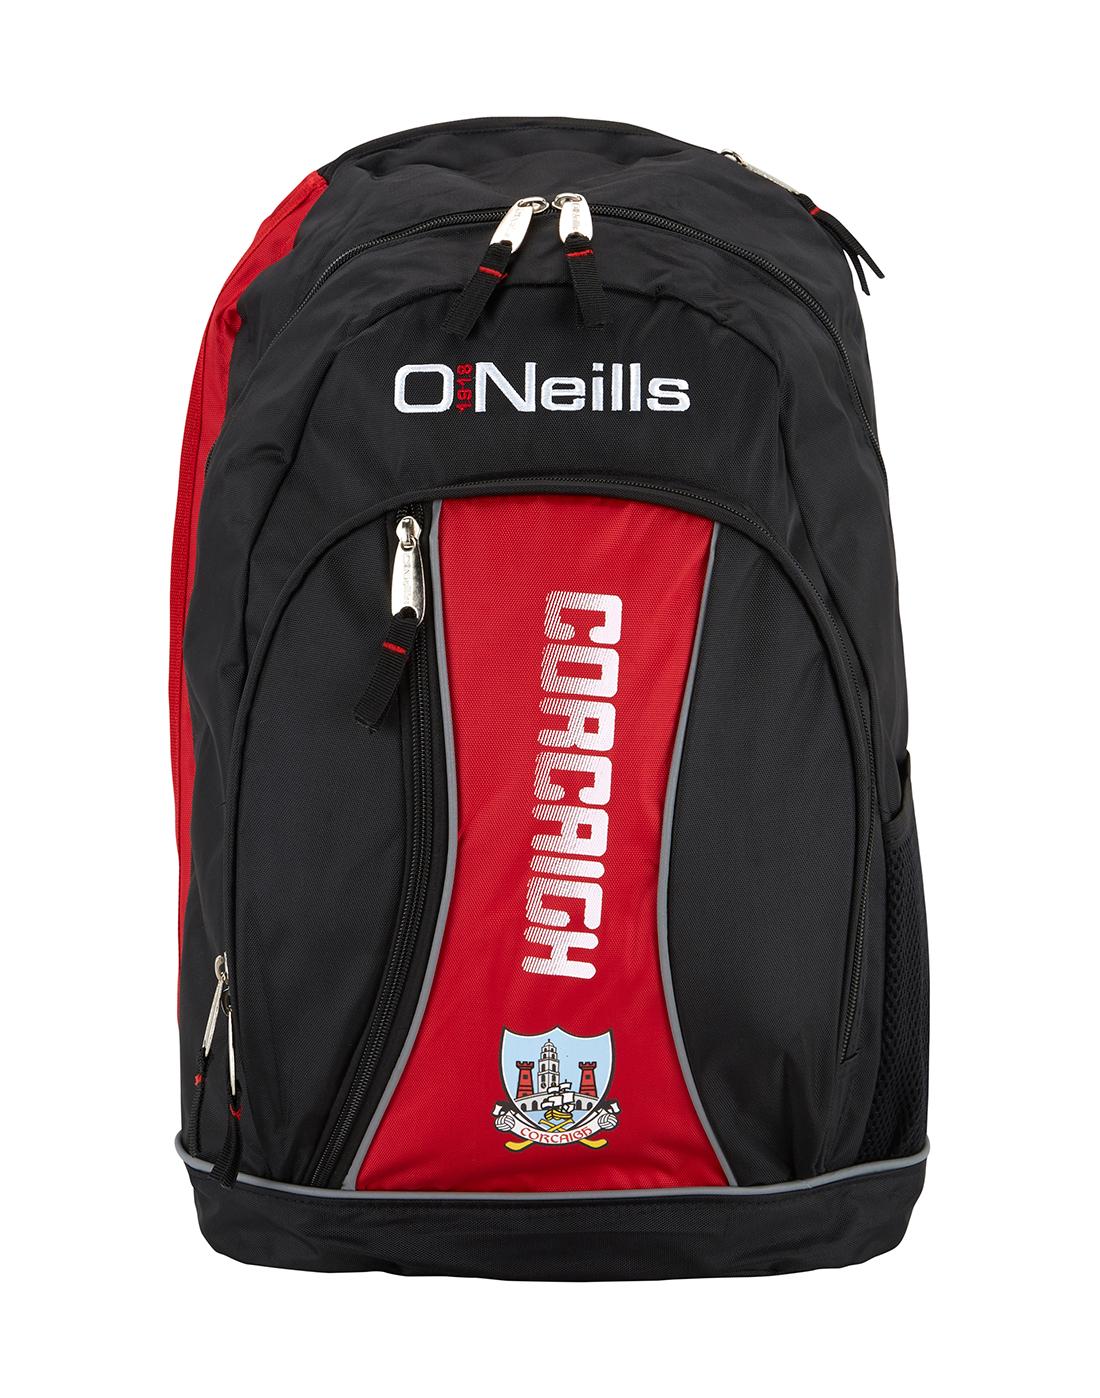 7468ea2c246376 O'Neills Cork GAA Backpack   Life Style Sports